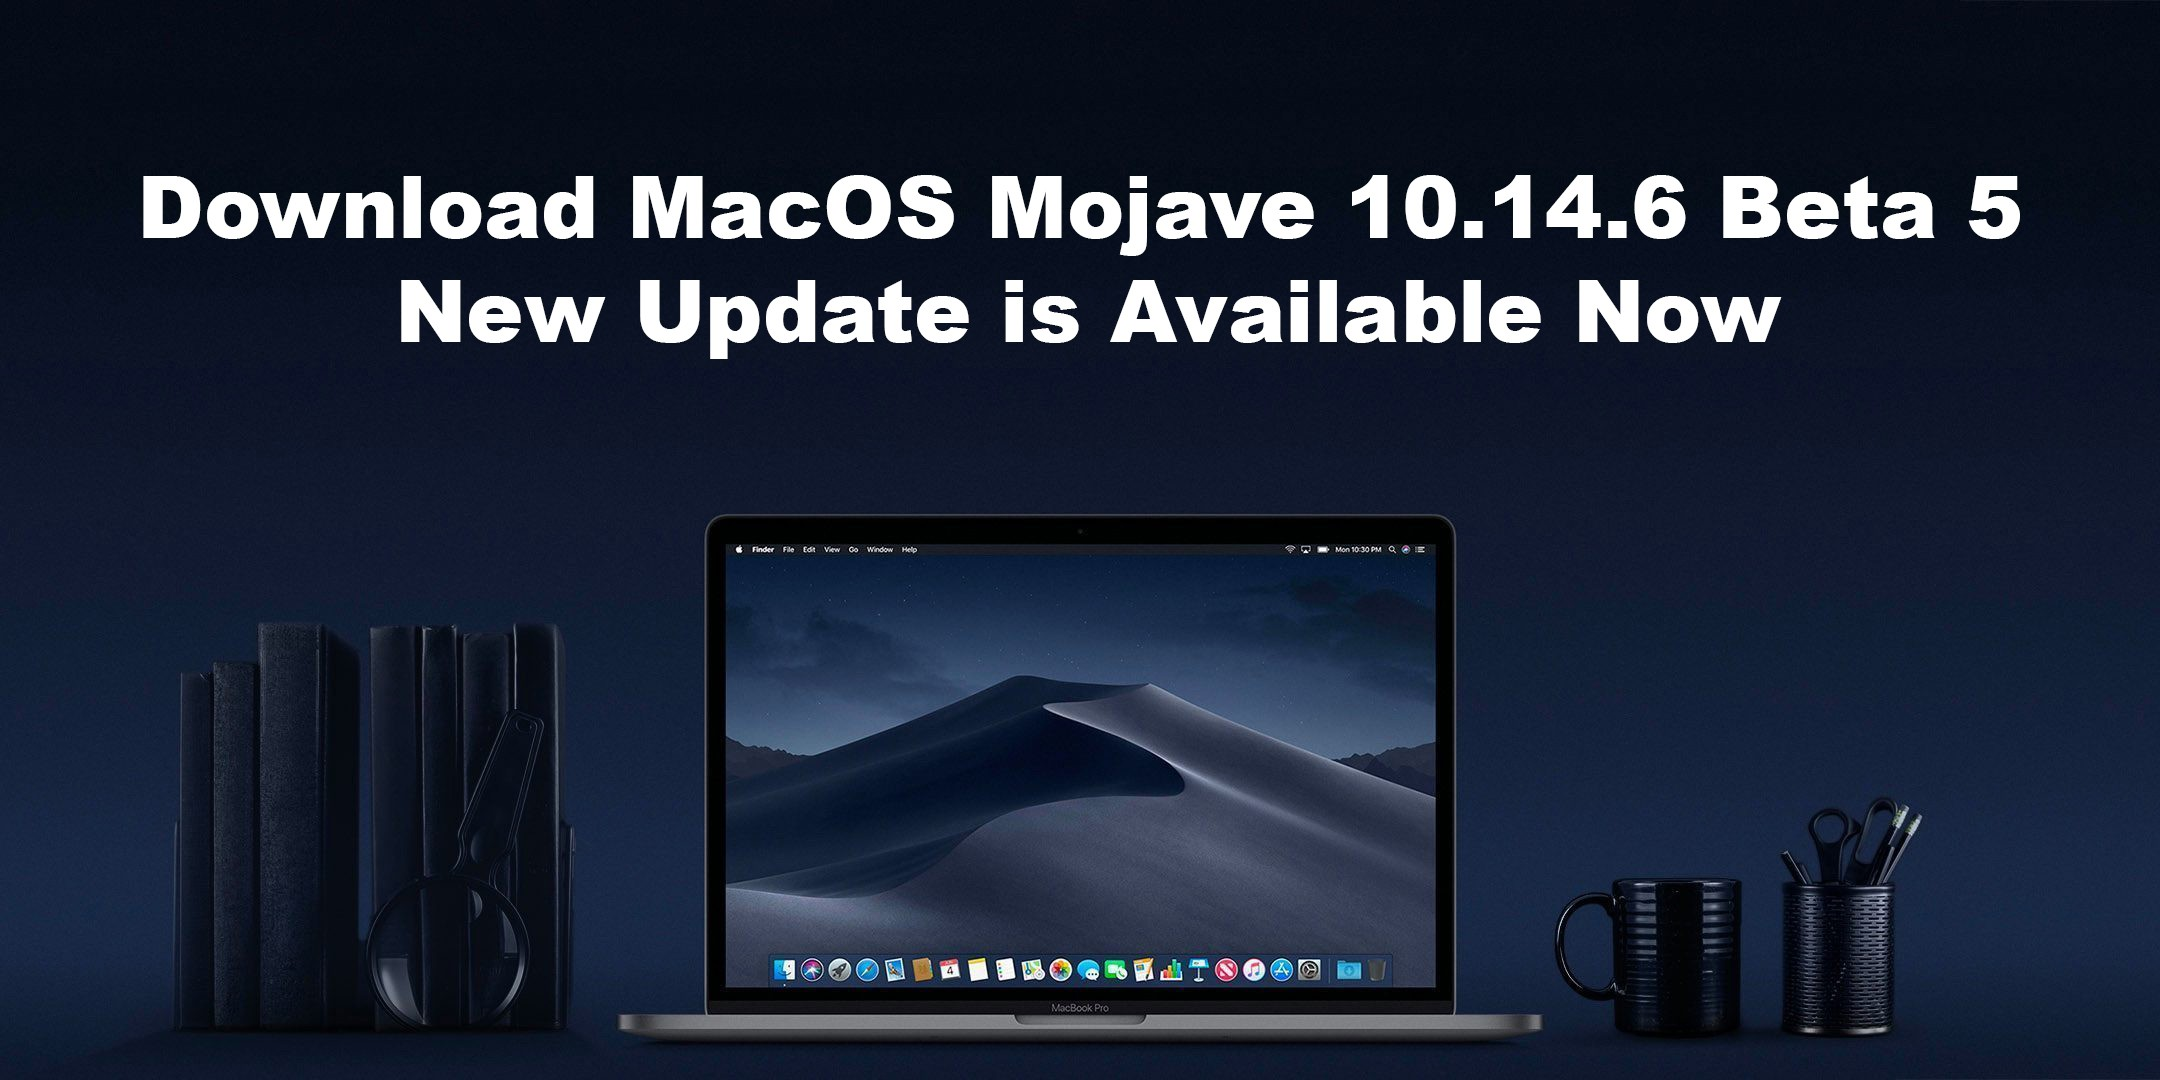 Download MacOS Mojave 10 14 6 Beta 5, New Update is